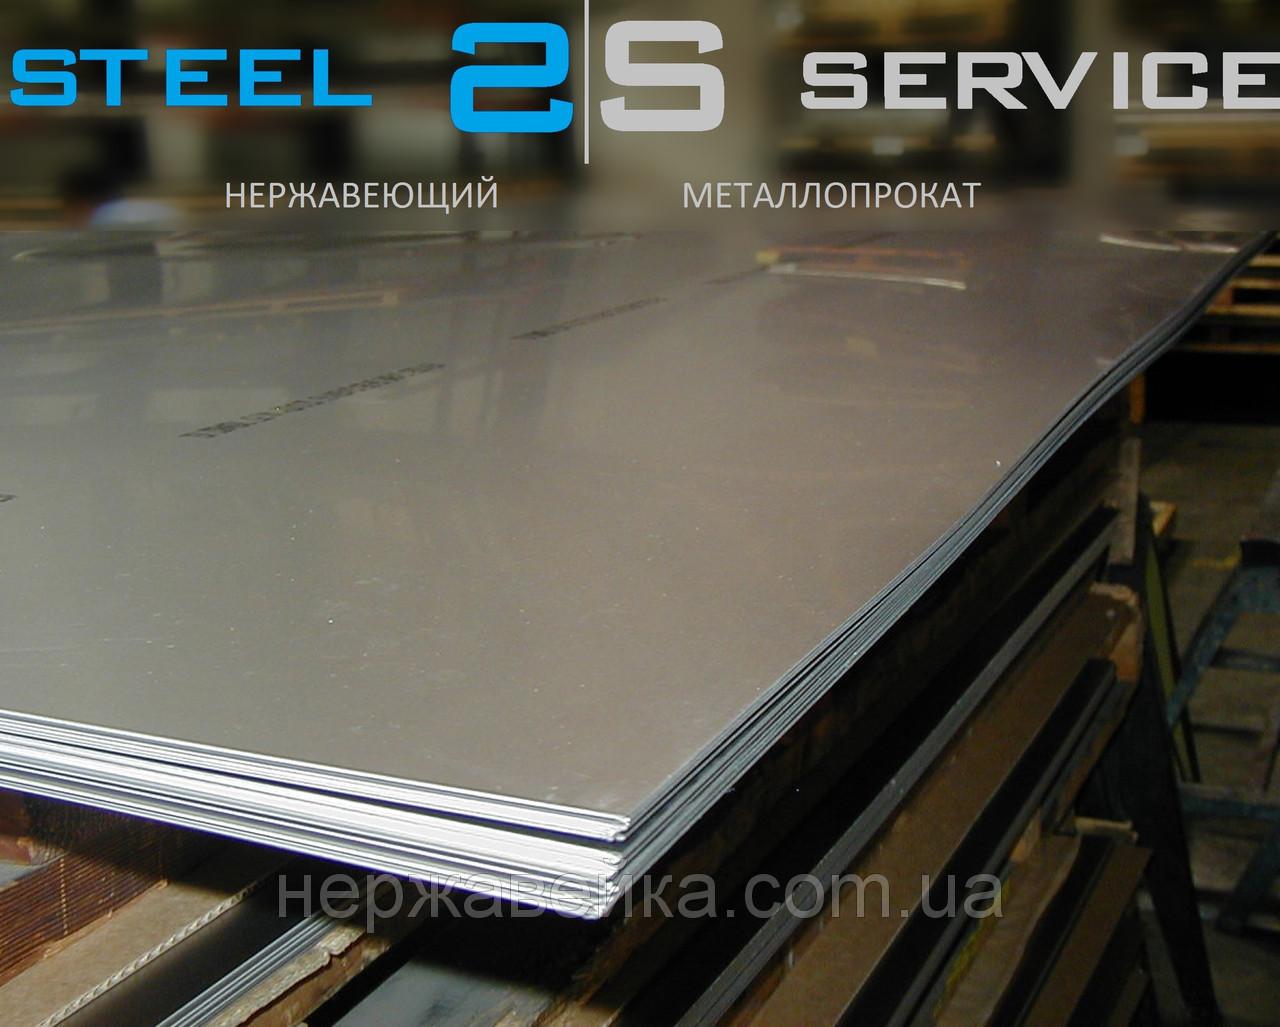 Нержавейка лист 6х1250х2500мм AISI 430(12Х17) 2B - матовый, технический